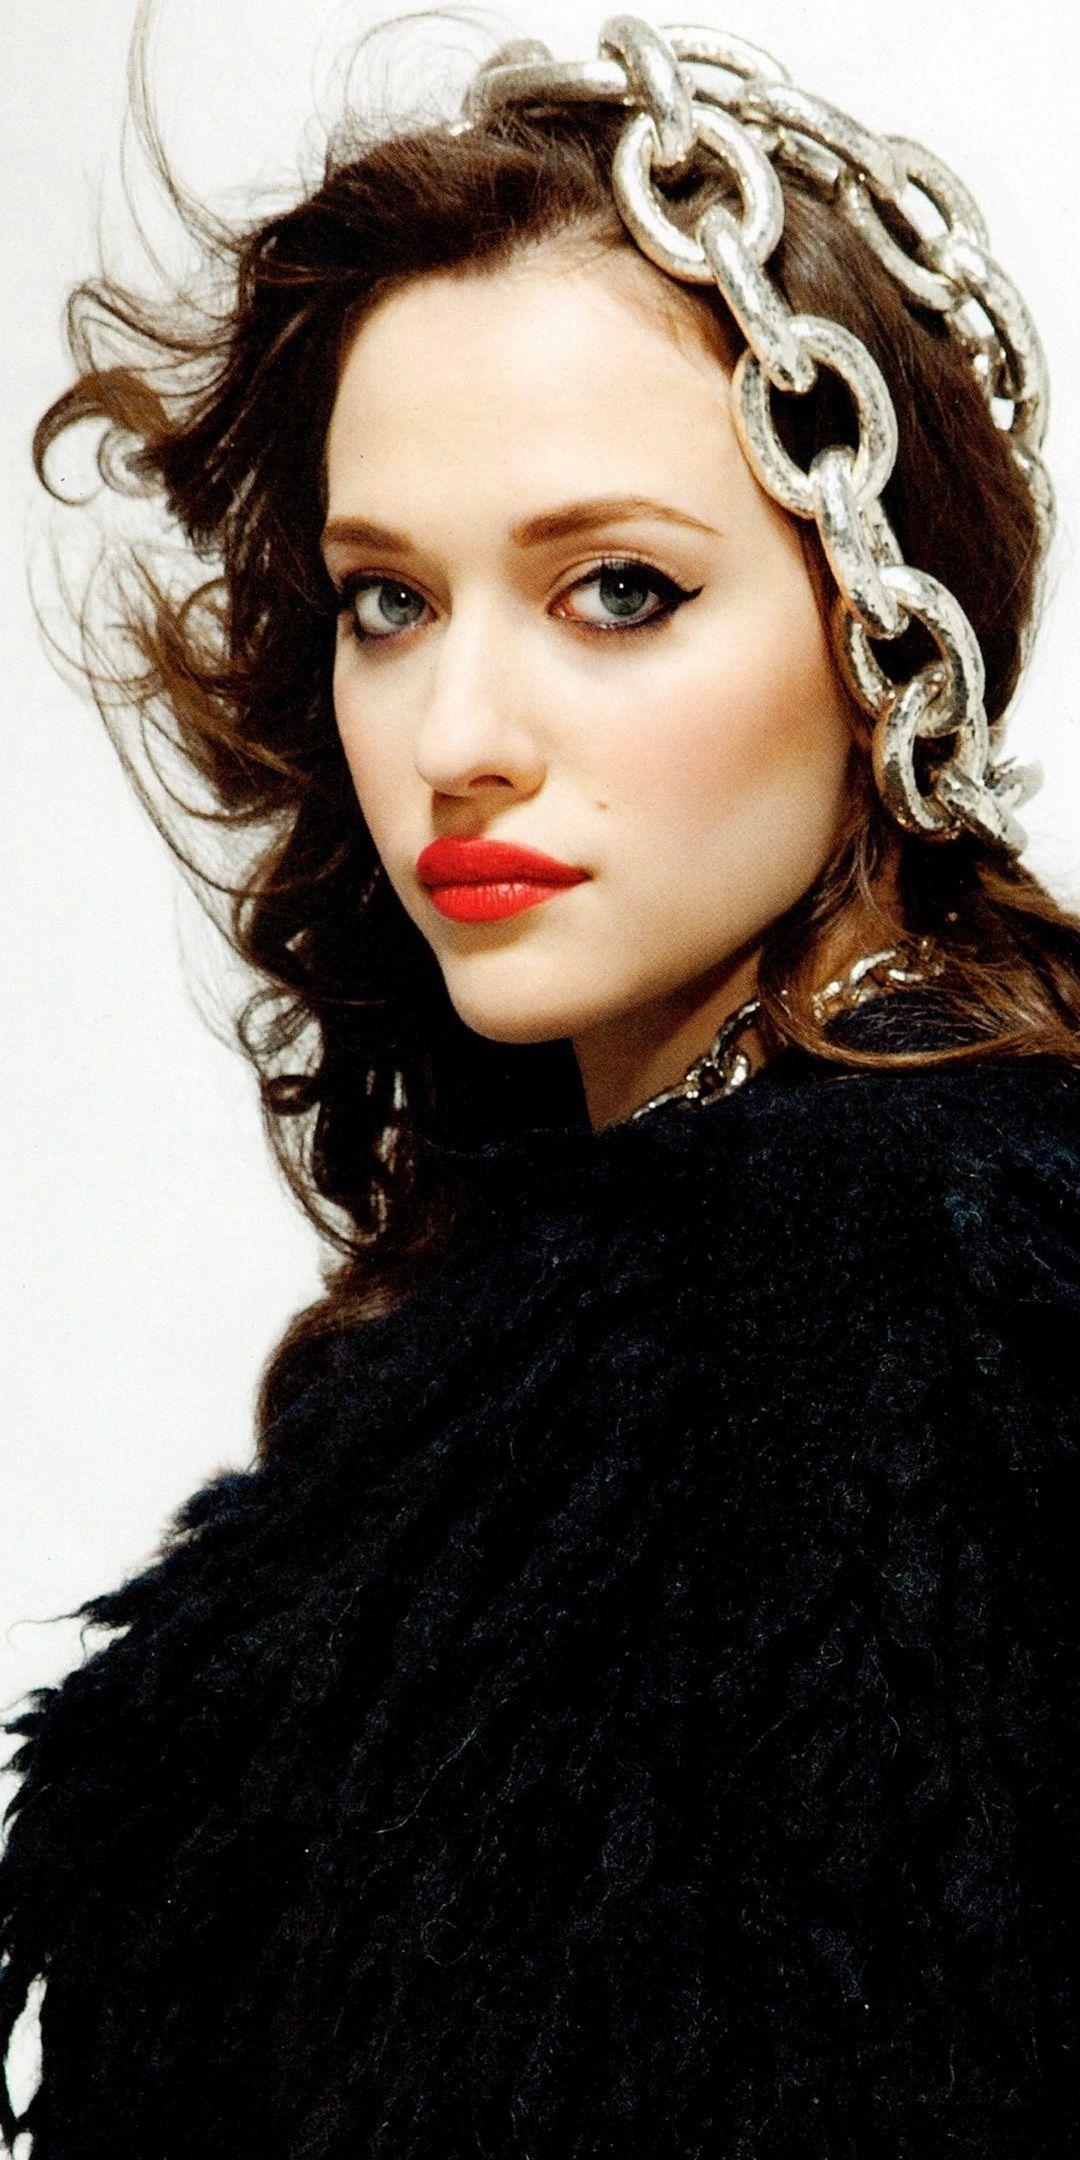 Red Lips Beautiful Kat Dennings 1080x2160 Wallpaper Red Lips Kat Dennings Beautiful